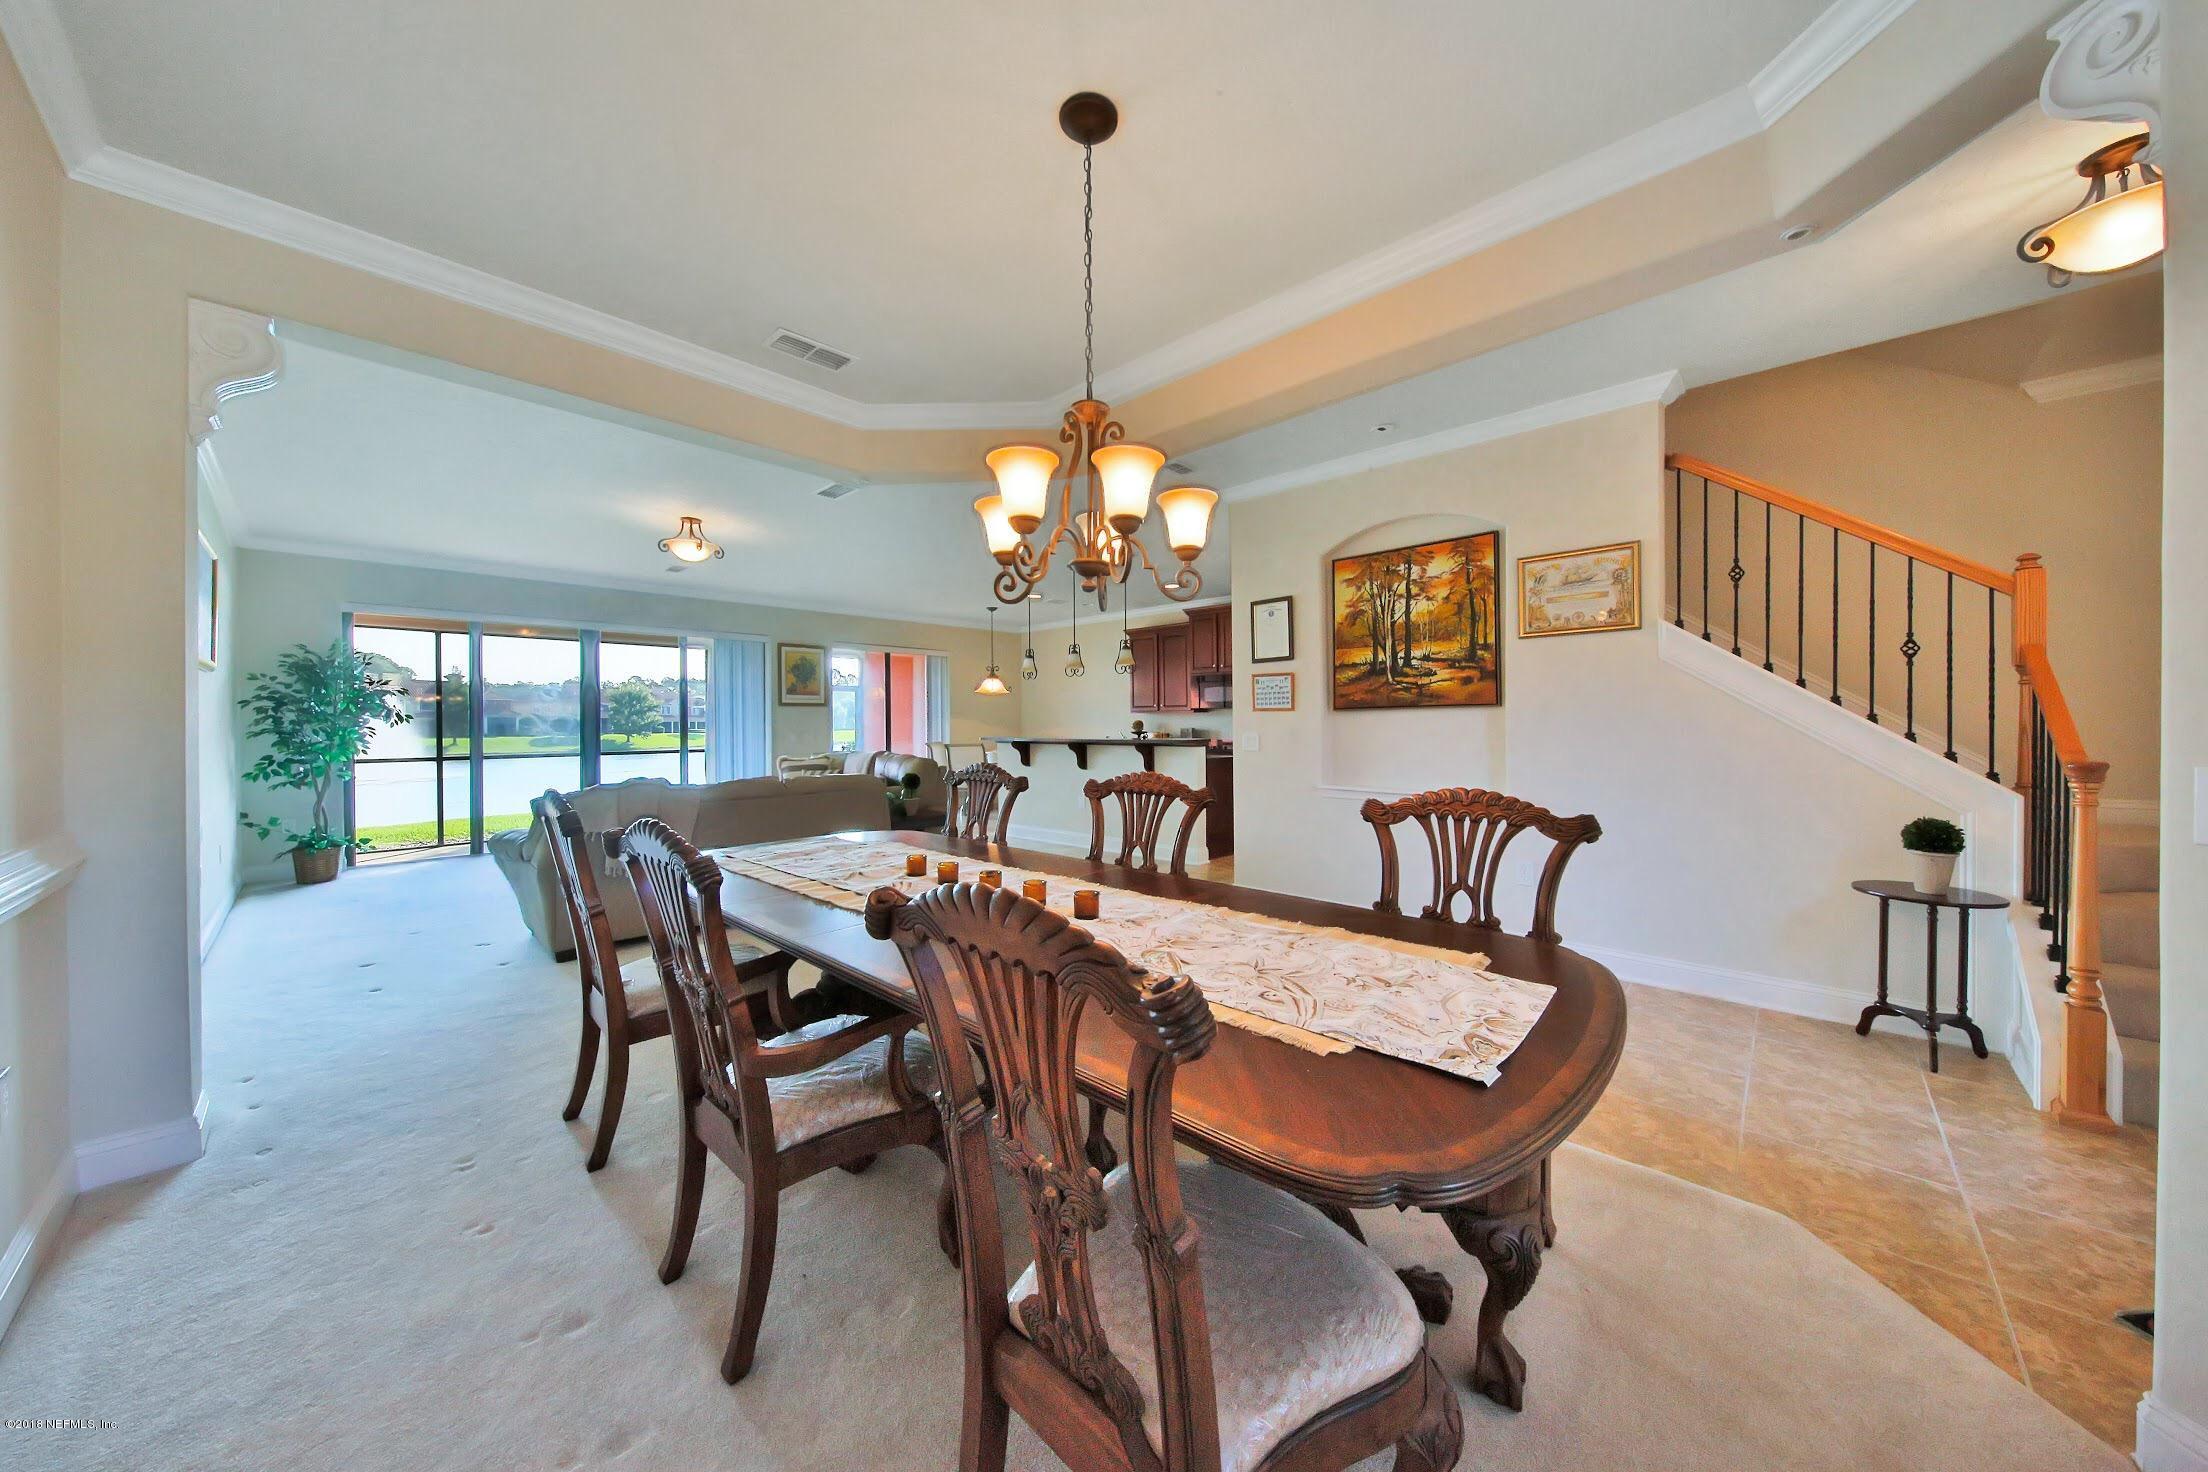 13563 ISLA VISTA, JACKSONVILLE, FLORIDA 32224, 3 Bedrooms Bedrooms, ,2 BathroomsBathrooms,Residential - townhome,For sale,ISLA VISTA,947181